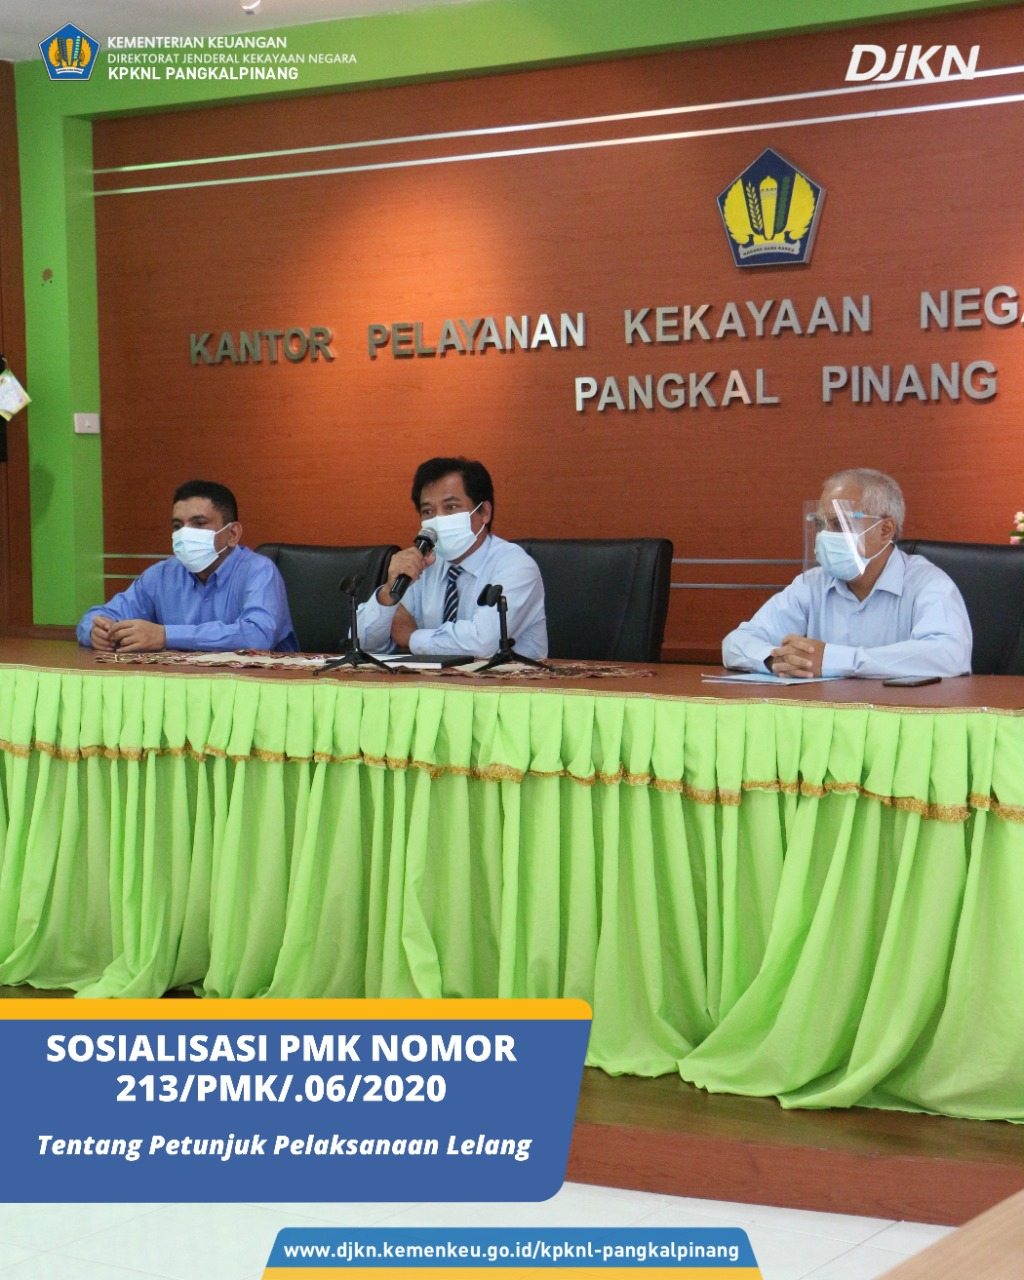 Sosialisasi PMK Nomor 213/PMK.06/2020 Sebagai Upaya Kesuksesan Lelang Eksekusi Hak Tanggungan